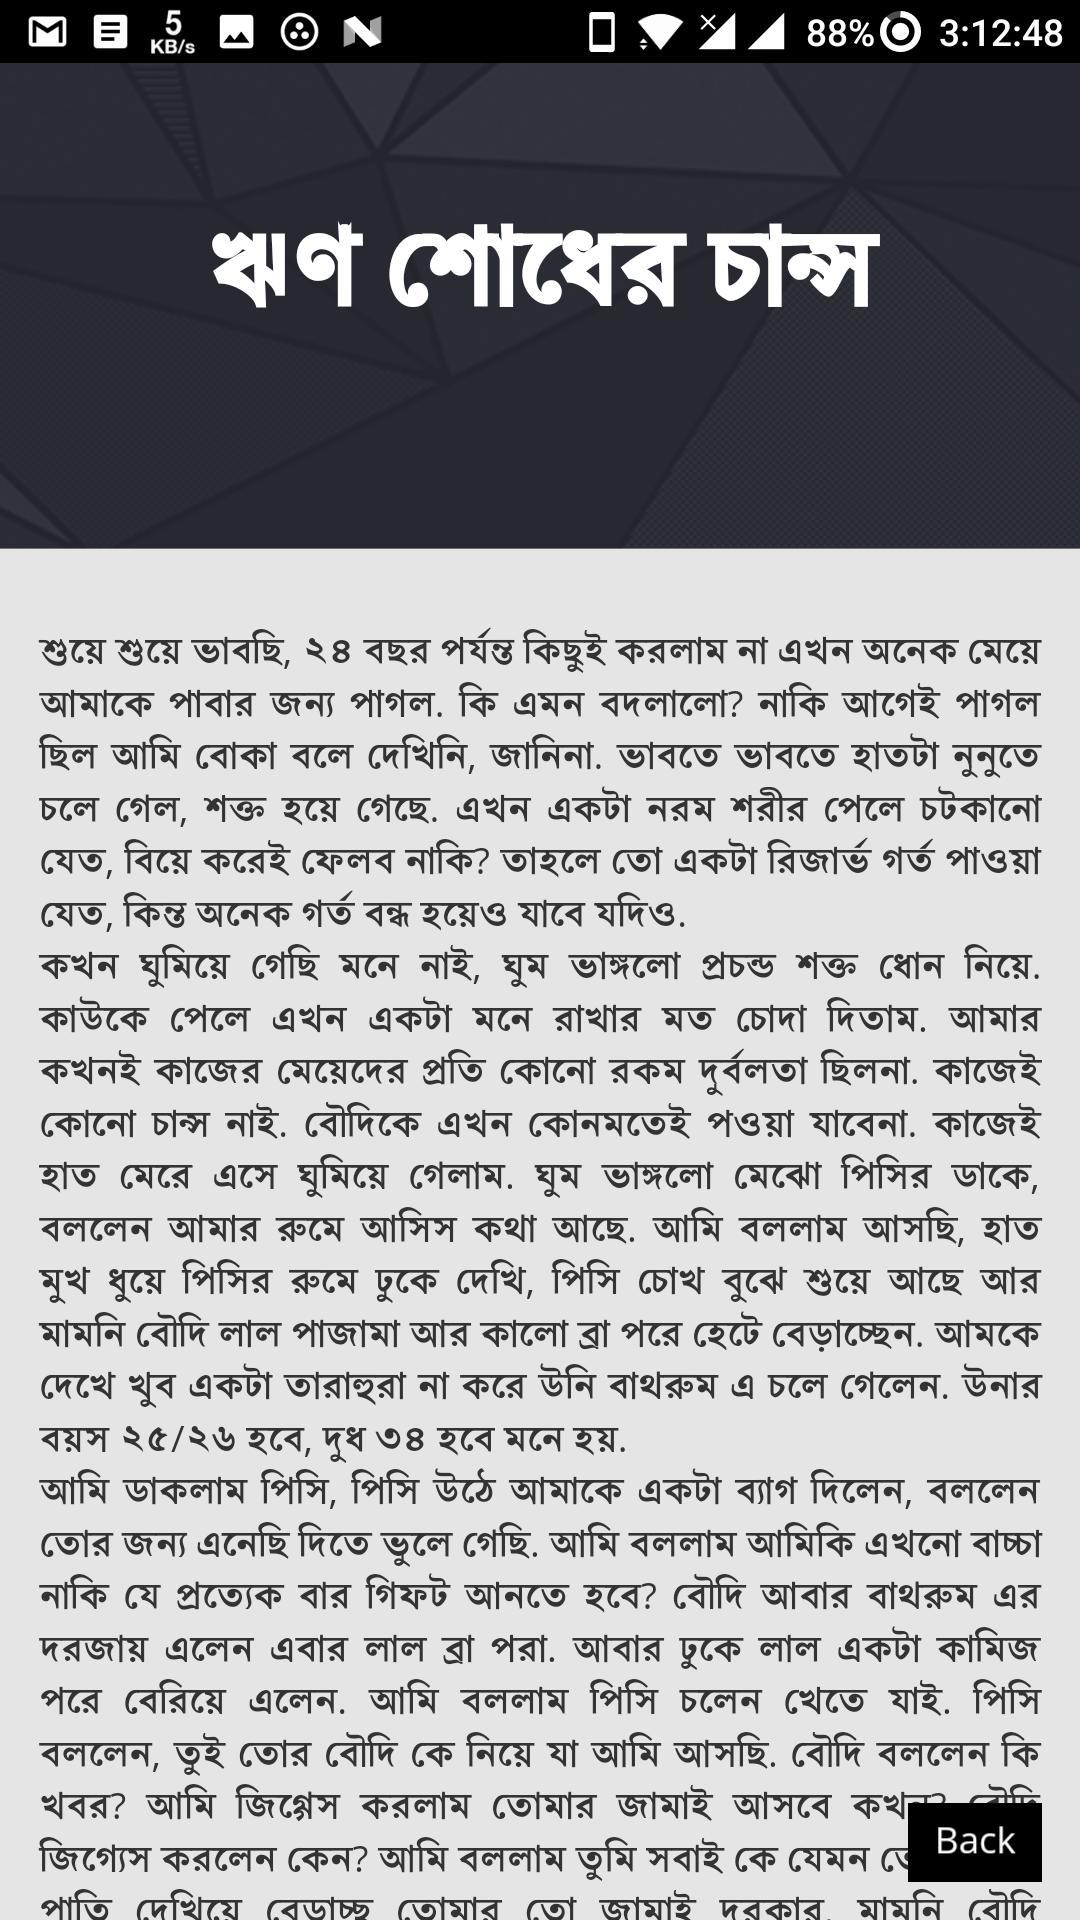 Bangla Choti বাংলার অজাচার চটি - bangla choti golpo for